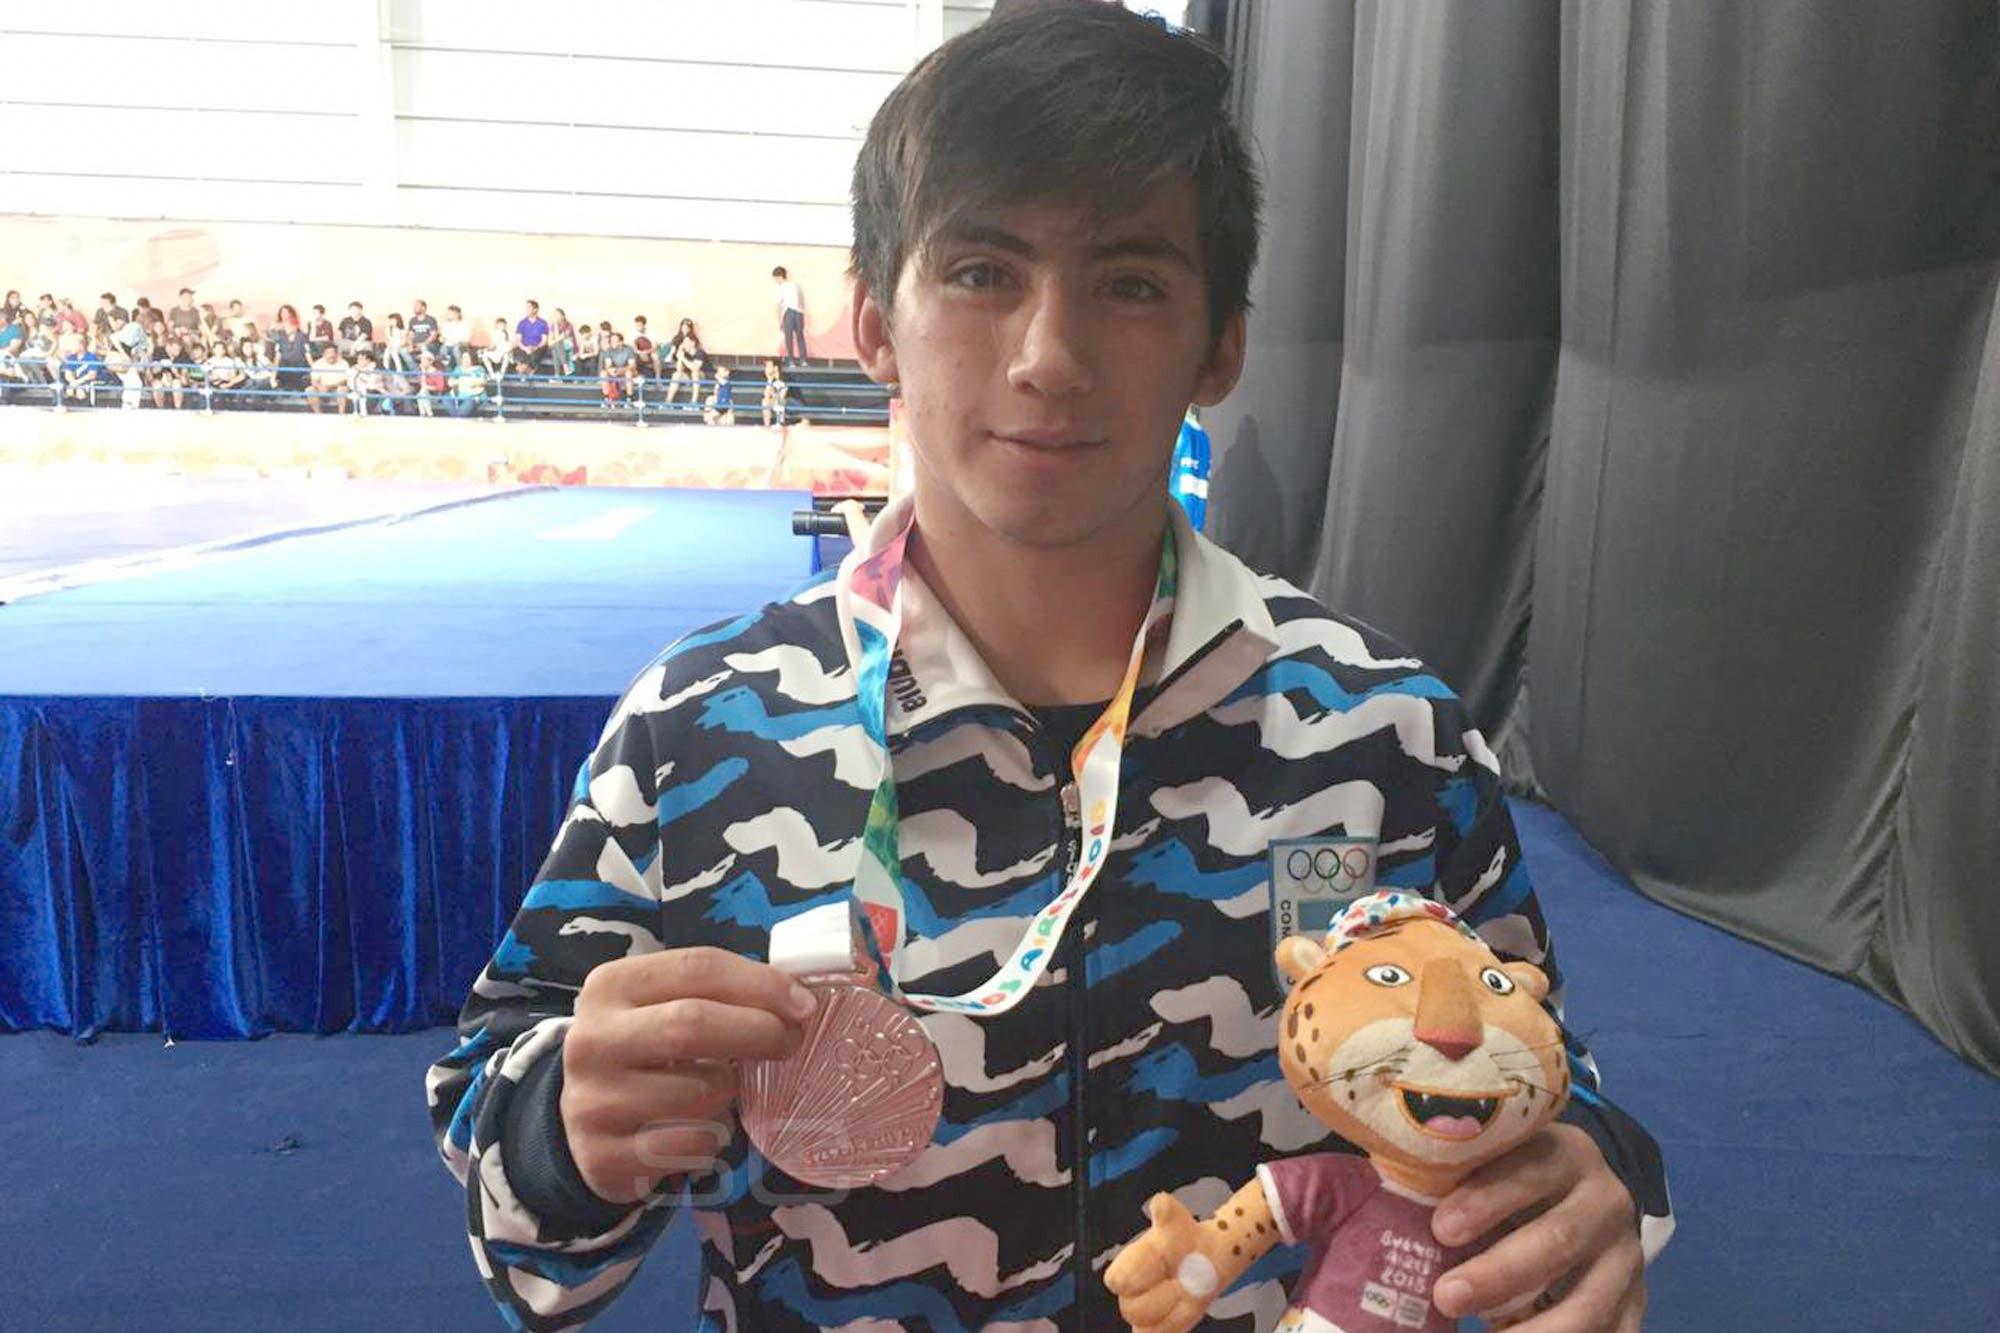 Juegos de la Juventud: David Almendra ganó la medalla de plata en lucha libre